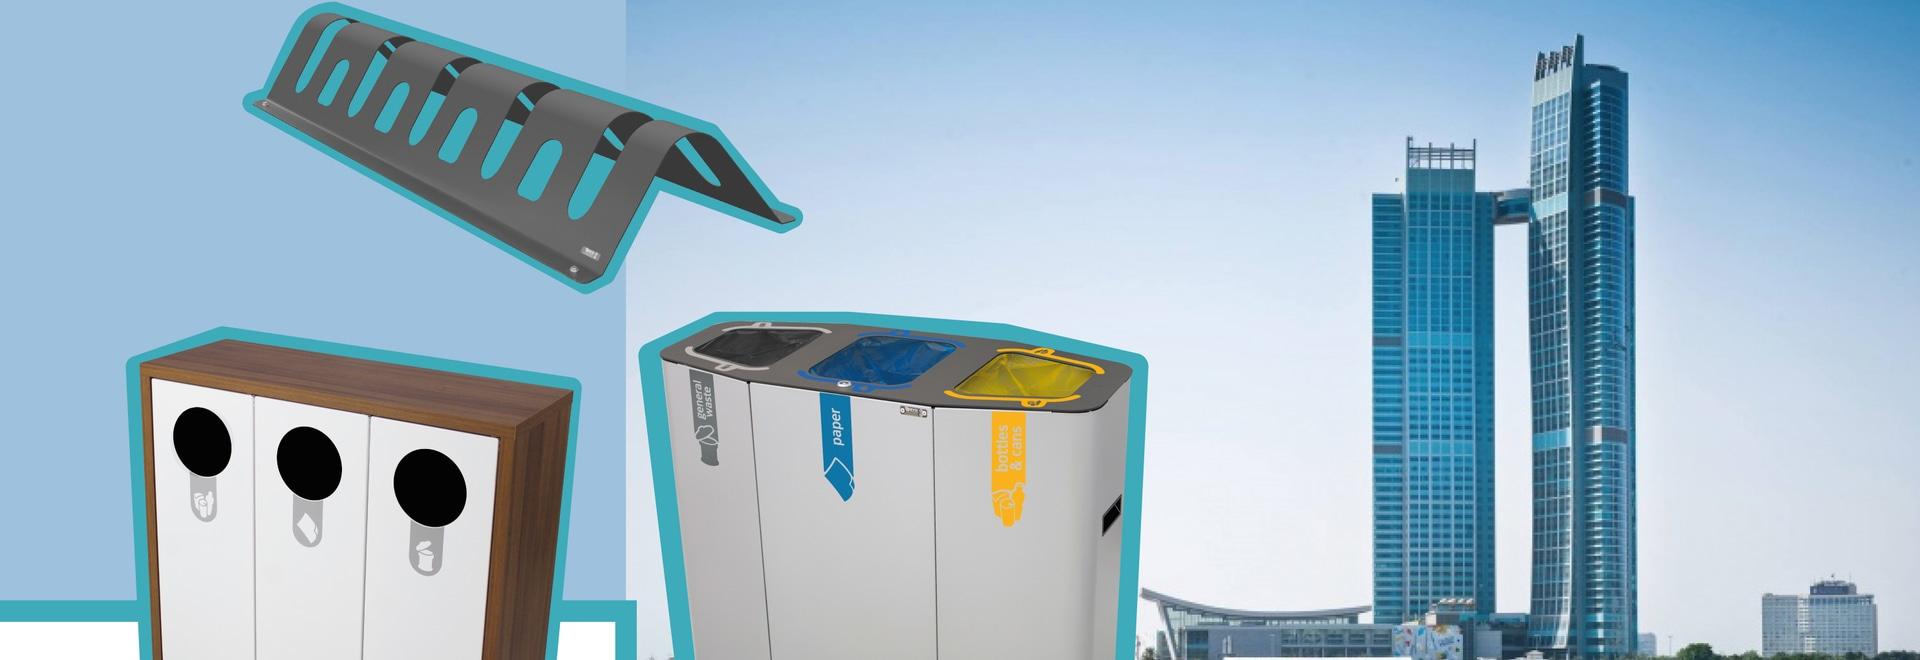 Las Nation Towers en Abu Dhabi se equipan con Cervic Environment